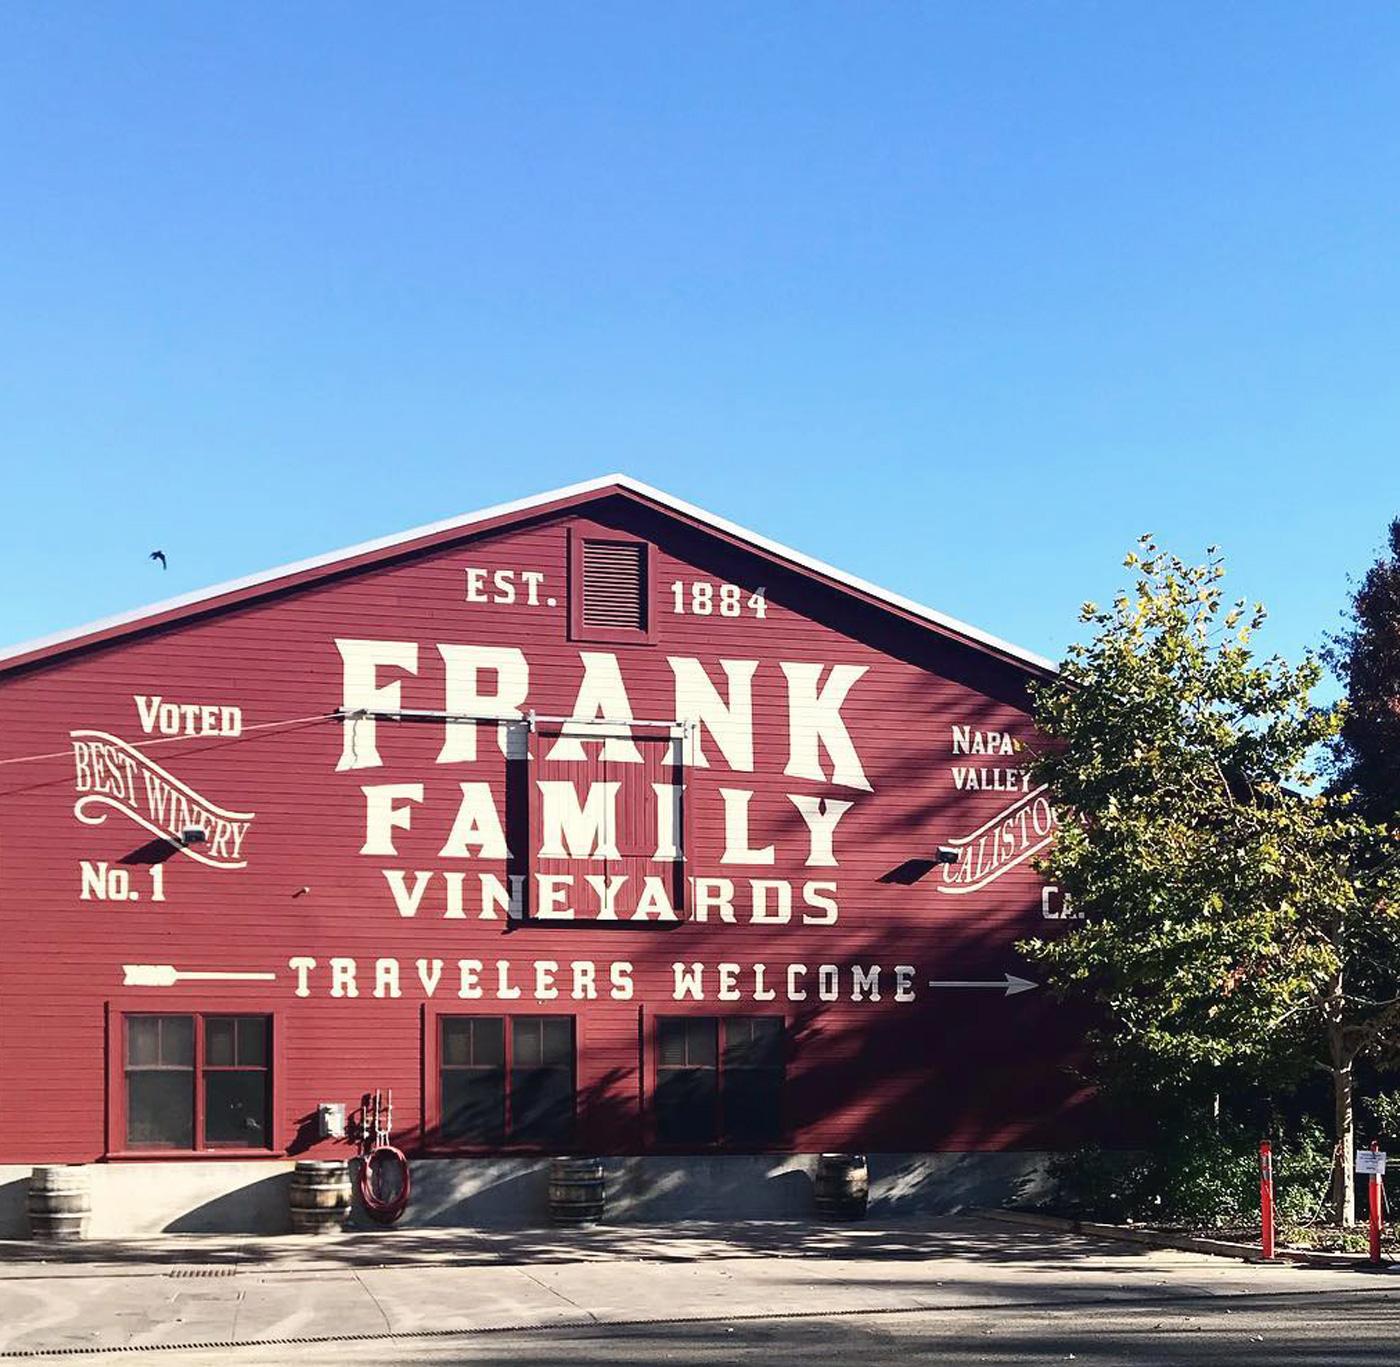 Frank Family Vineyards, Napa Valley.